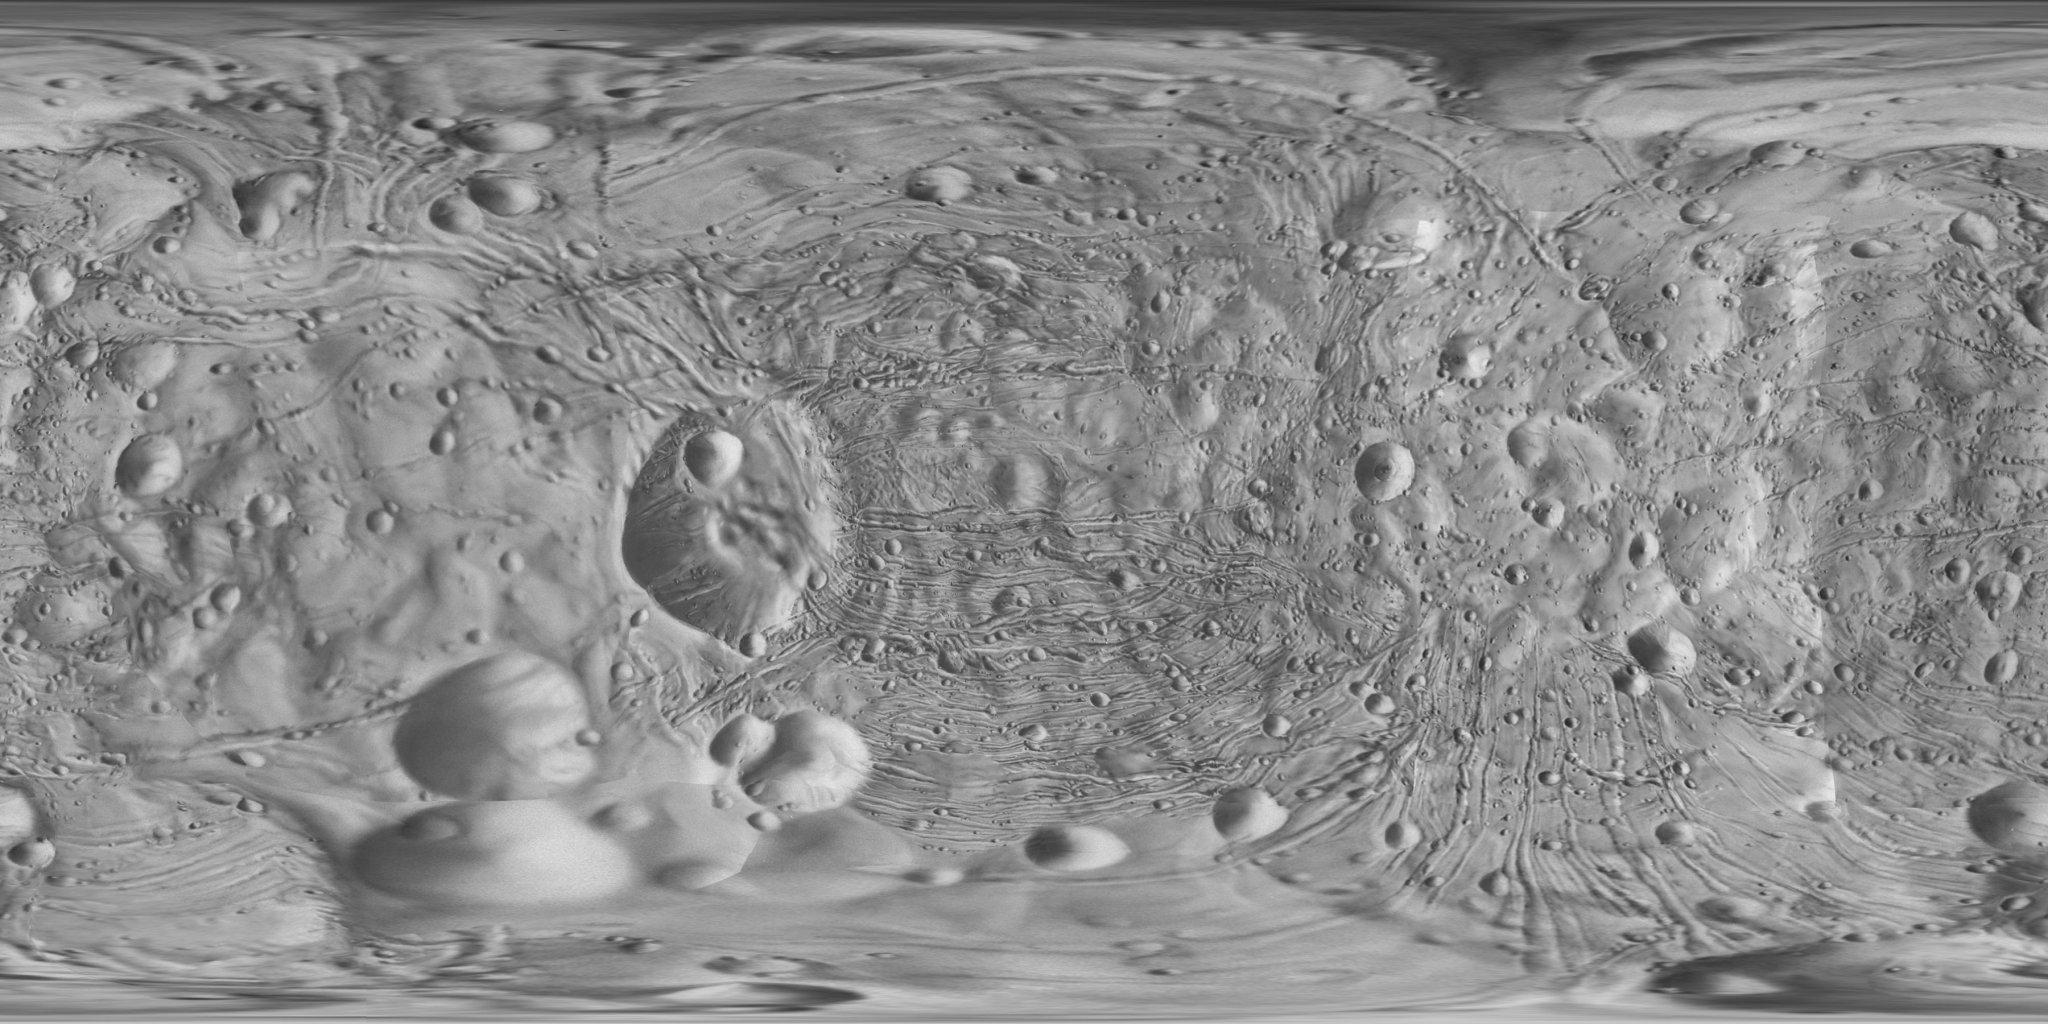 textures surface of saturn nasa - photo #31